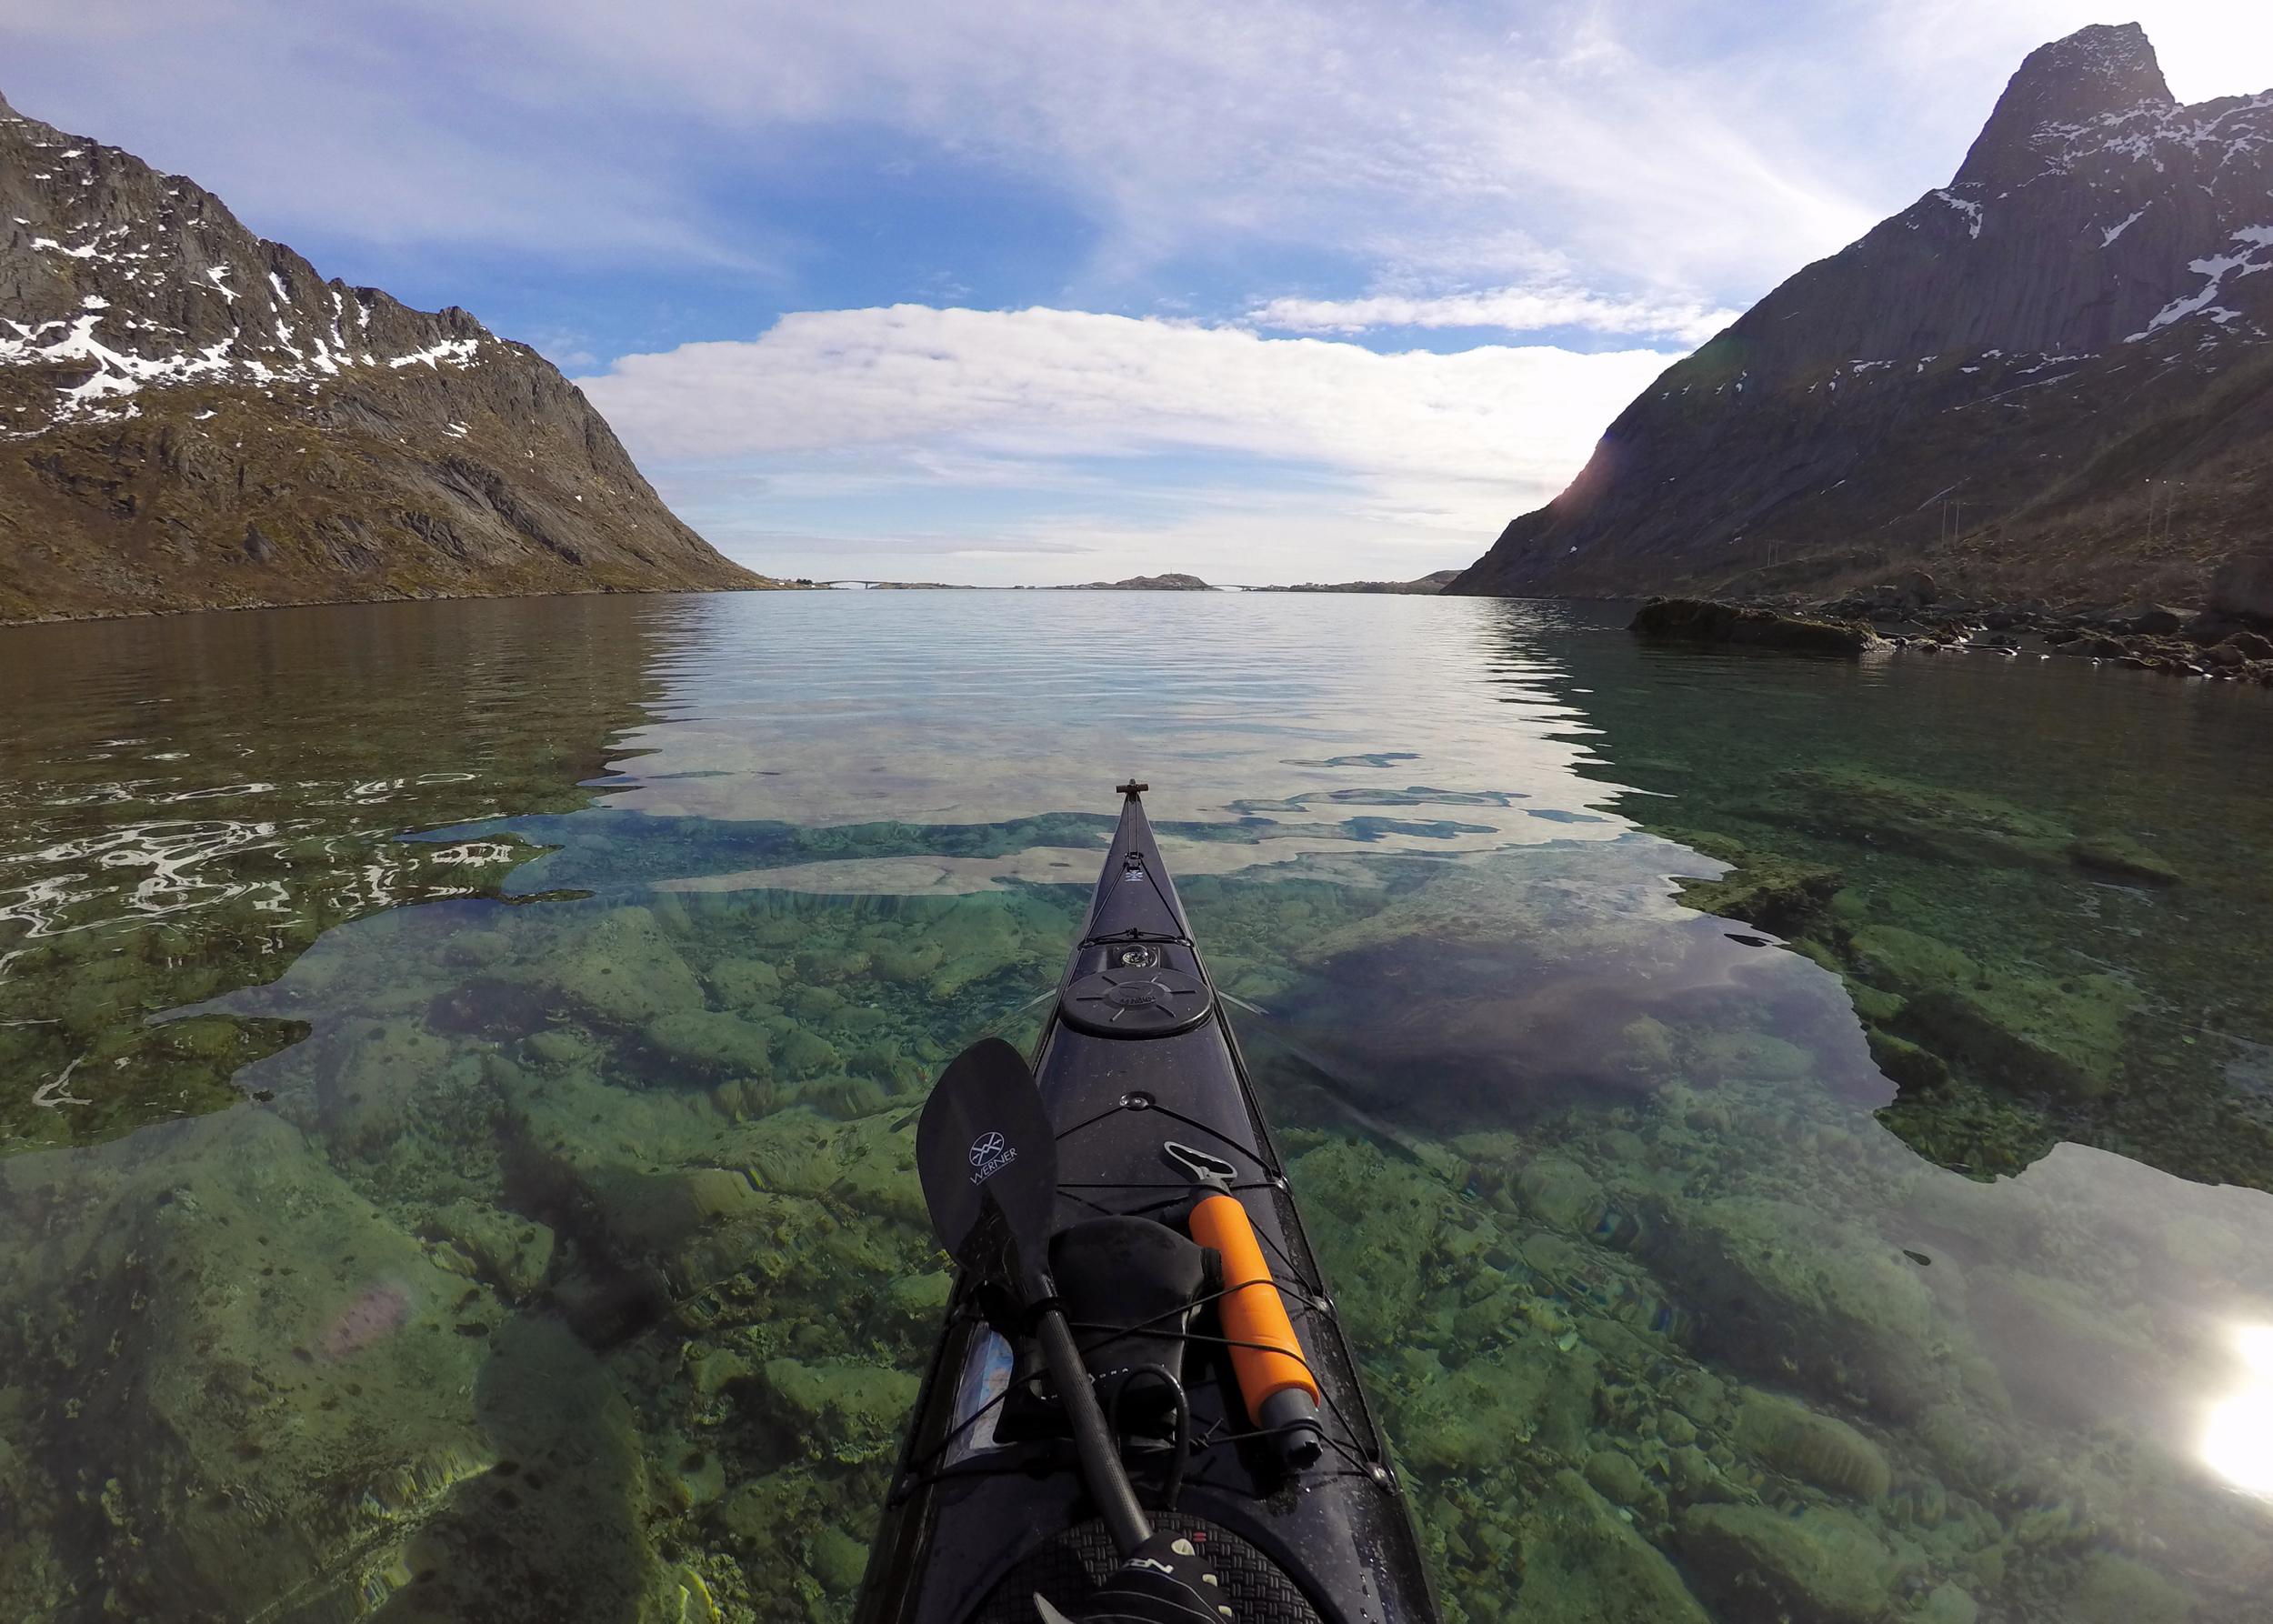 Vorfjord, Lofoten islands, Norway